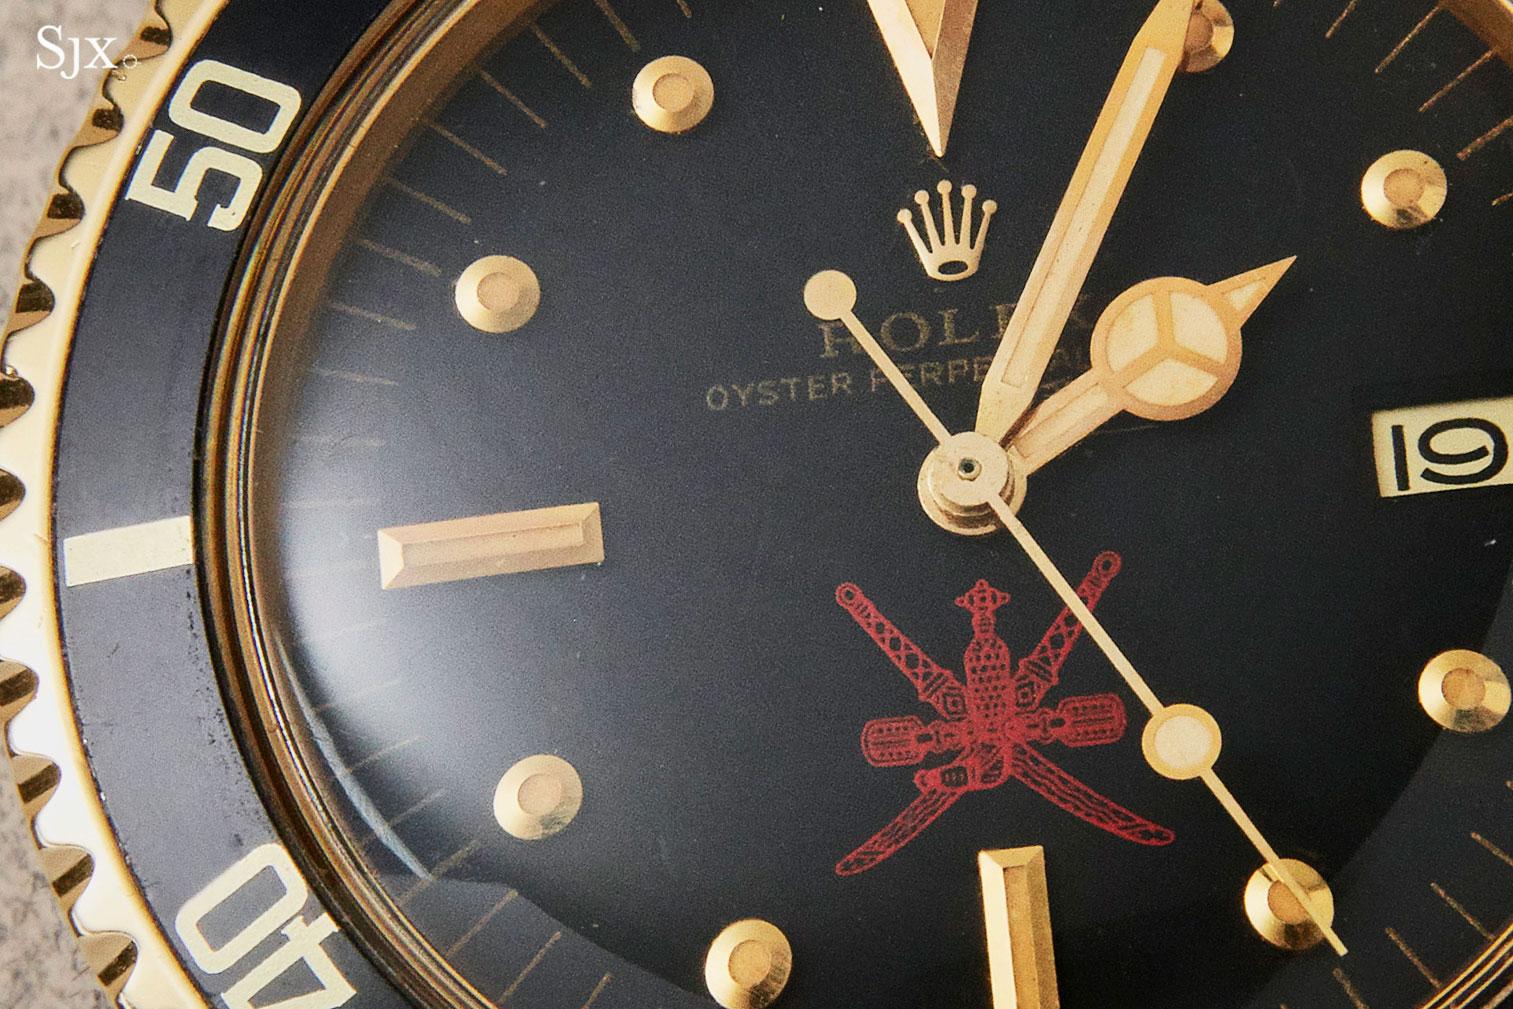 Rolex Submariner gold 1680 red khanjar 1